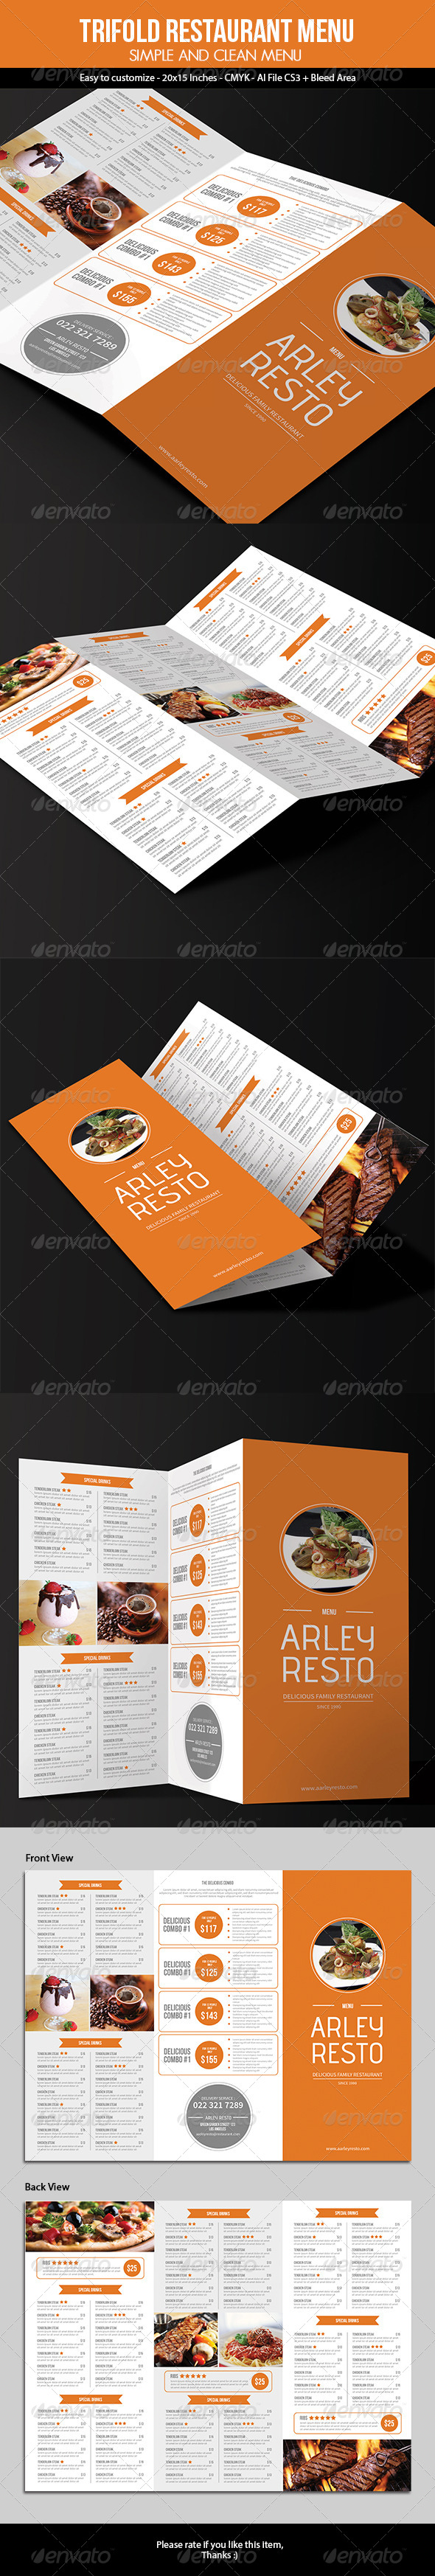 GraphicRiver Trifold Simple Restaurant Menu 7457969